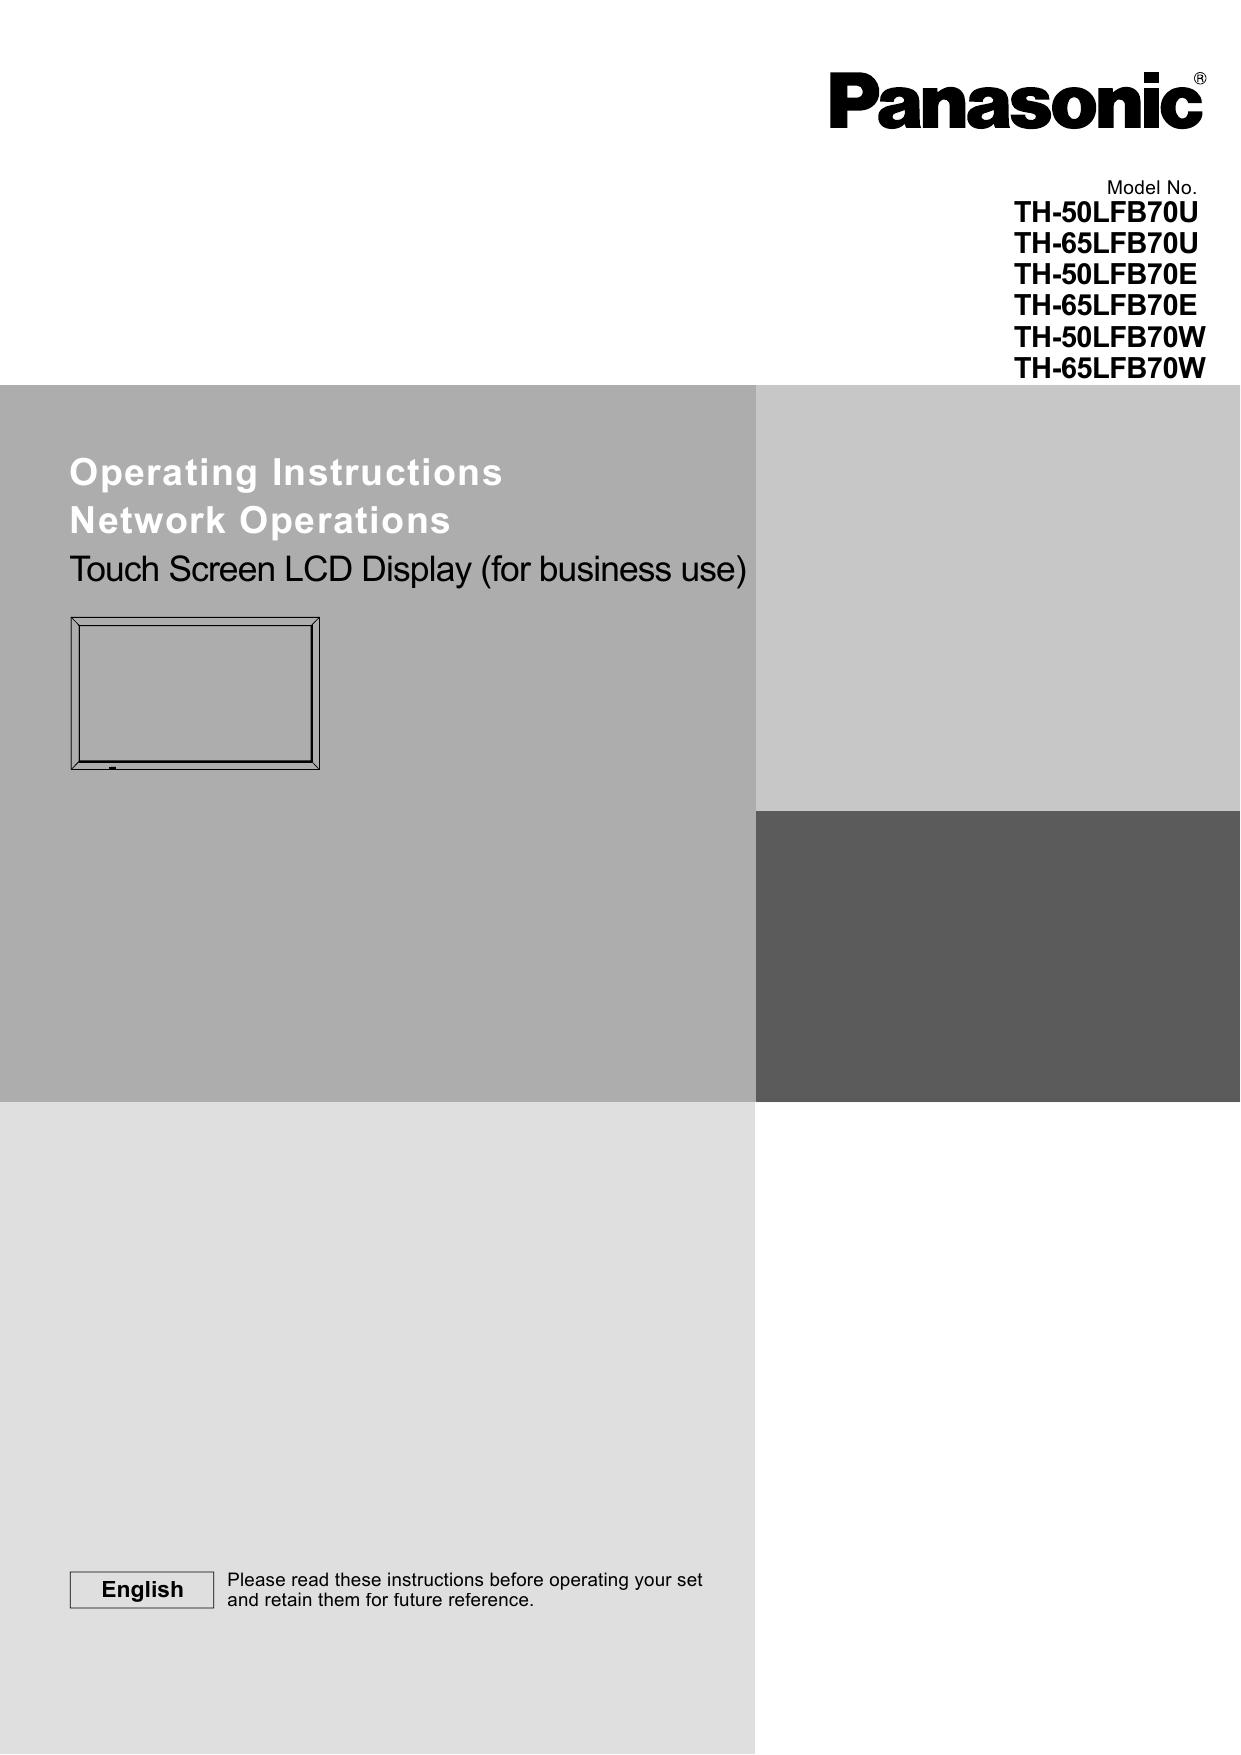 Panasonic TH50LFB70E Operating Instructions | manualzz com